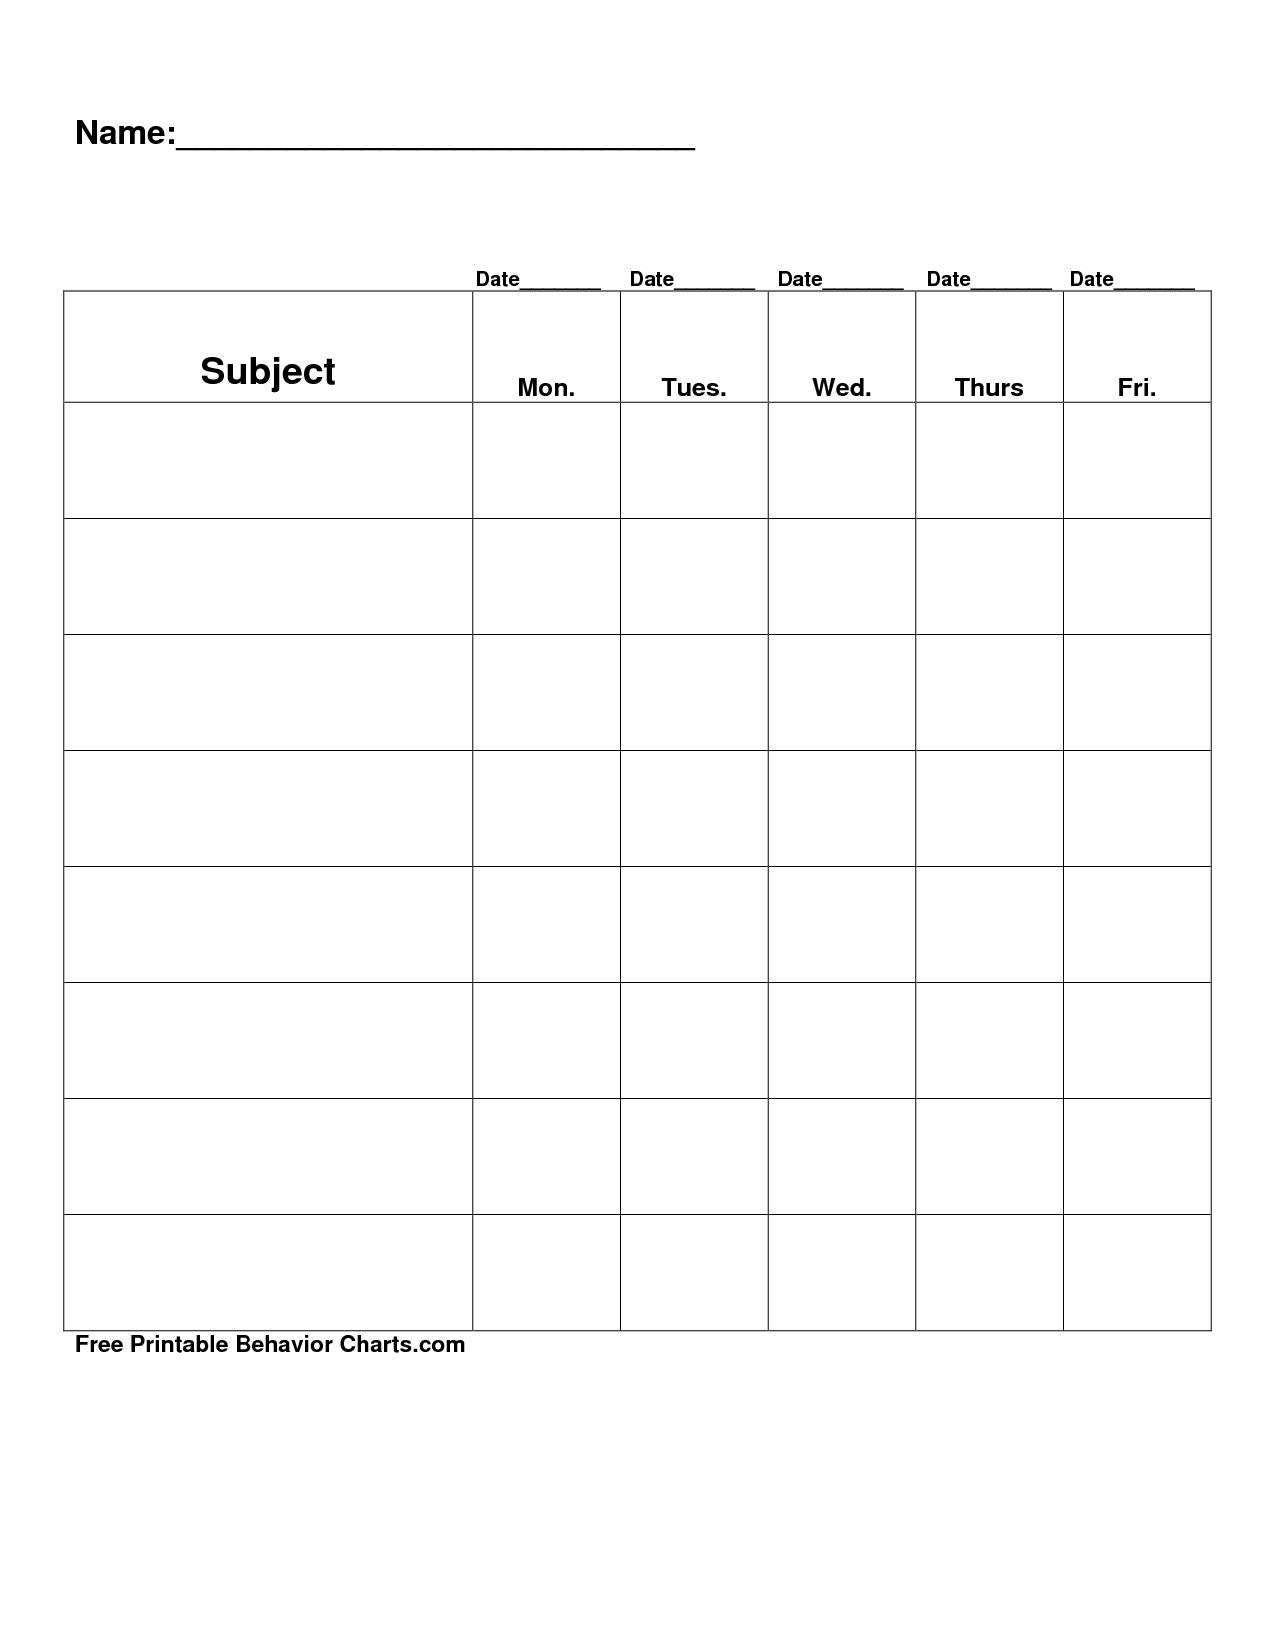 Free Printable Blank Charts   Free Printable Behavior Charts Com - Free Printable Incentive Charts For Teachers